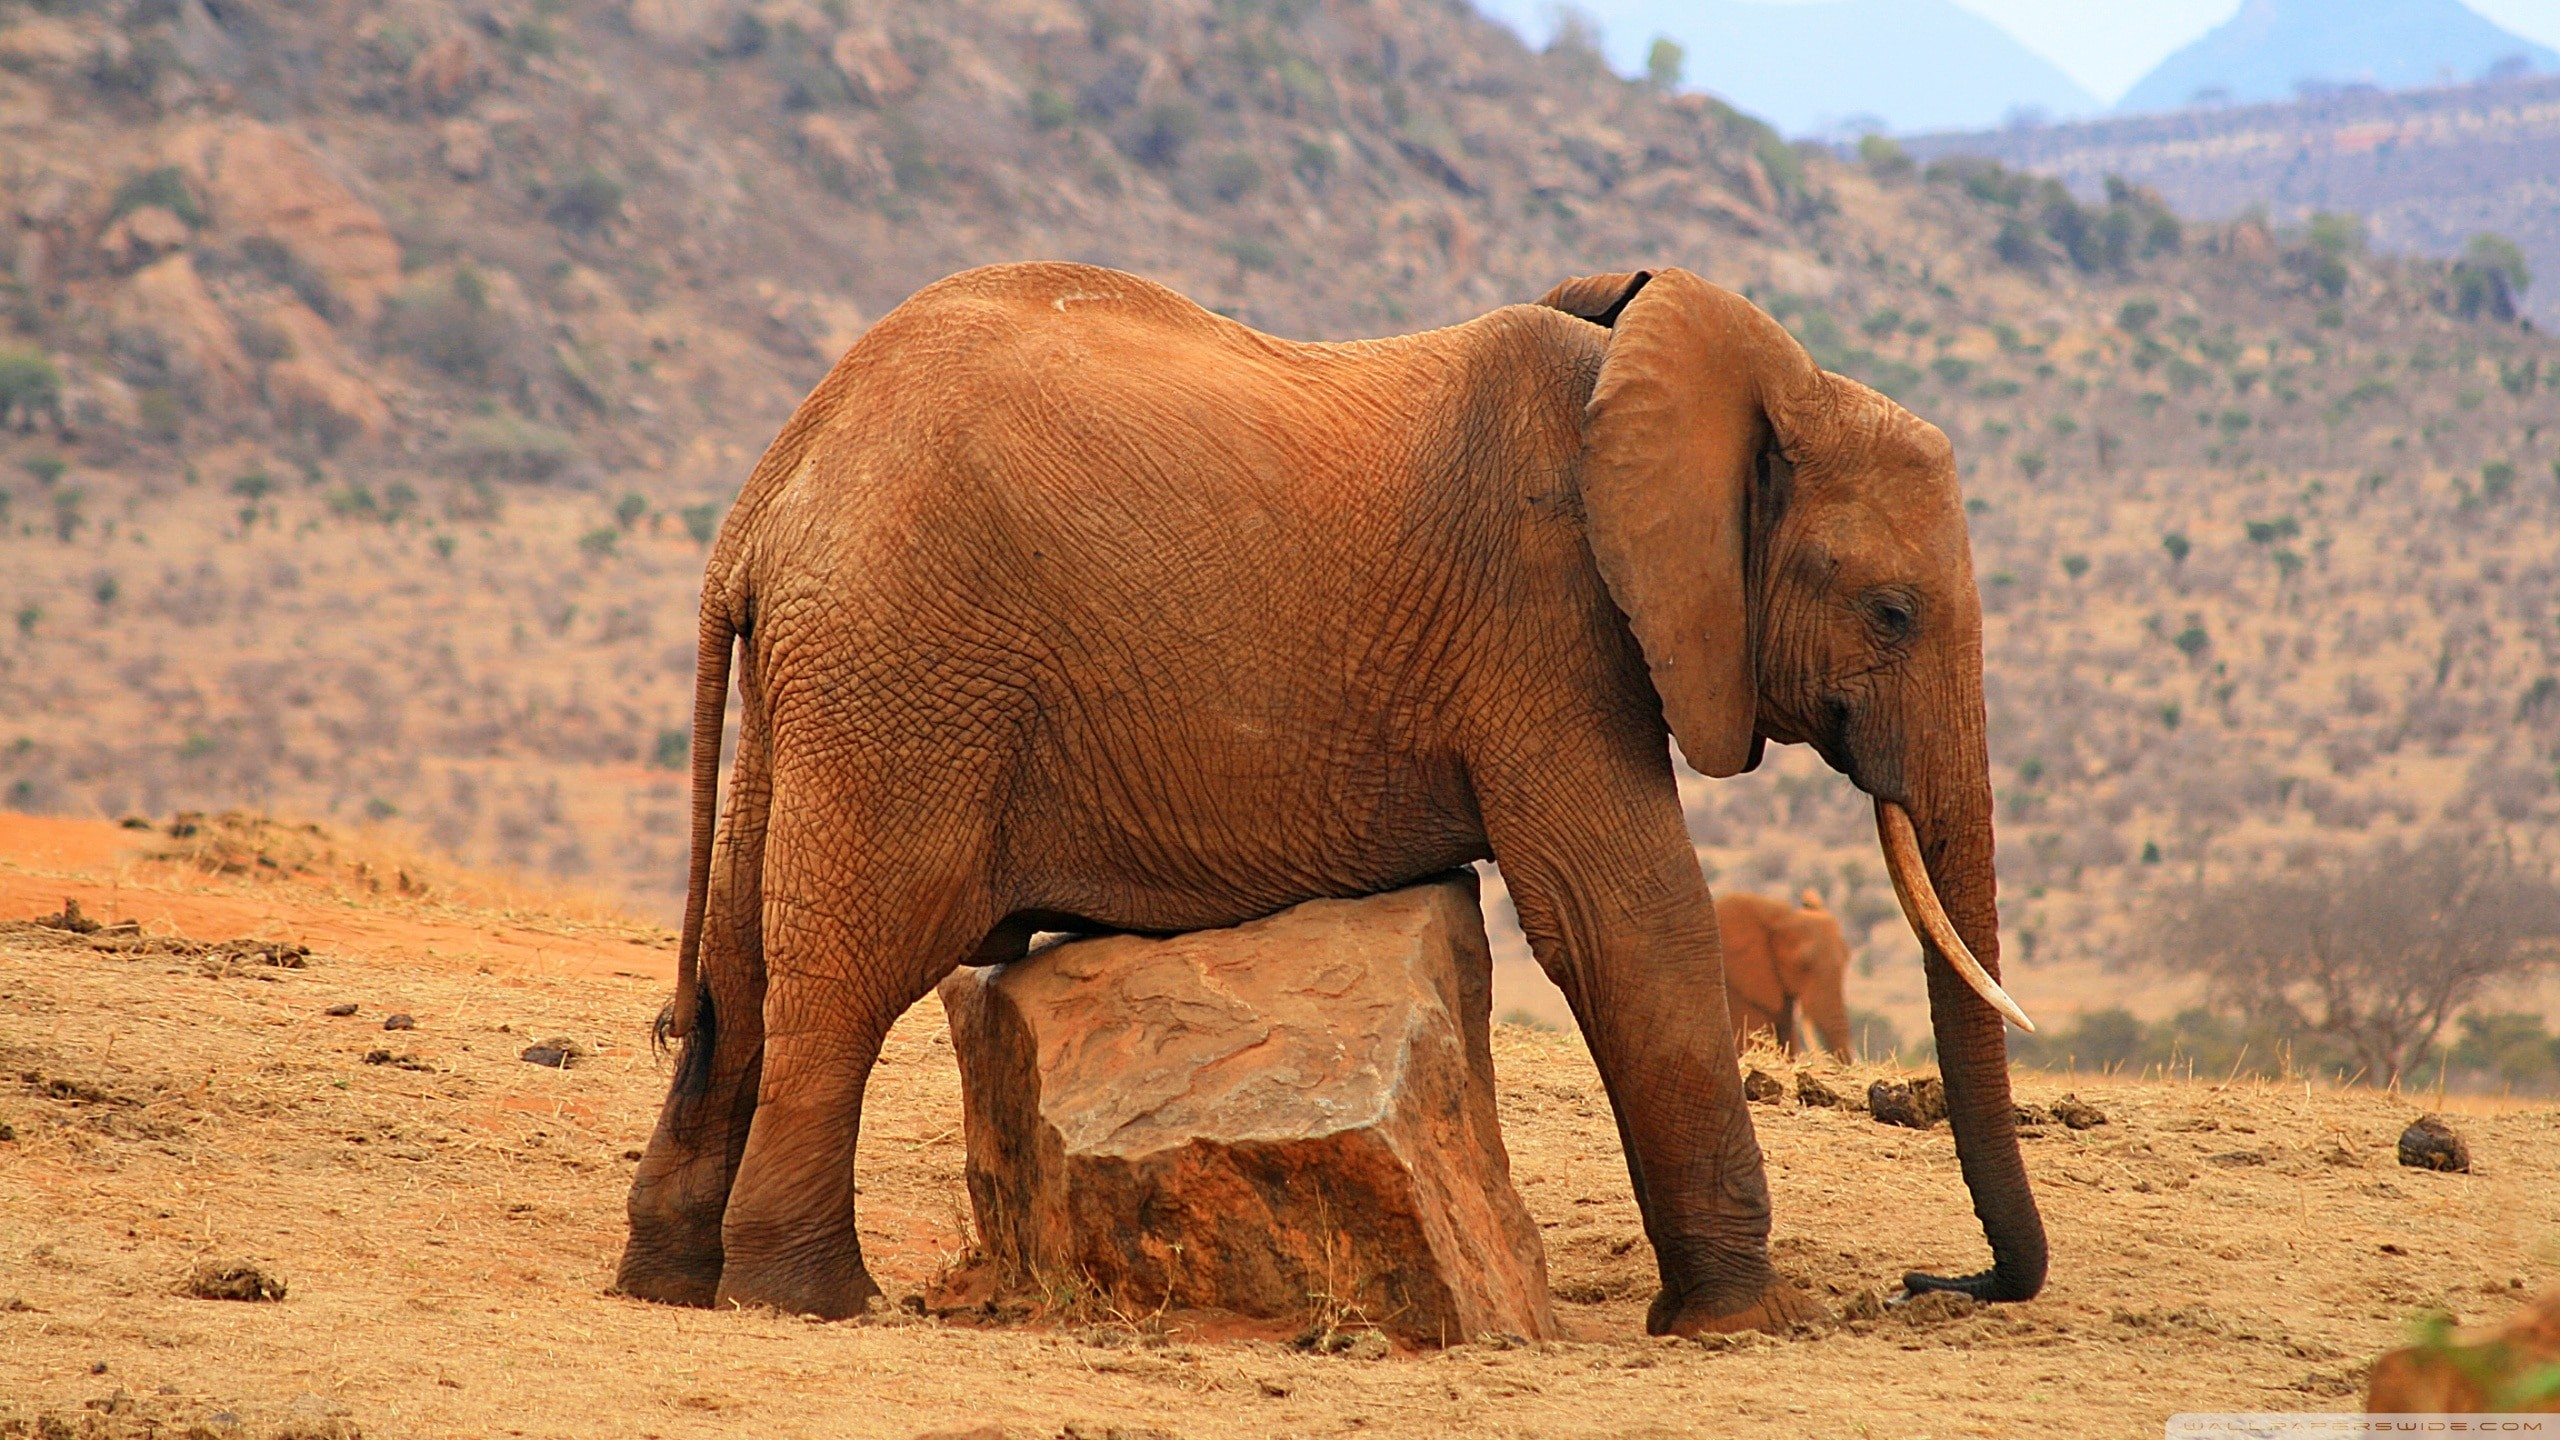 Res: 2560x1440, elephant wallpaper hd photo - 1